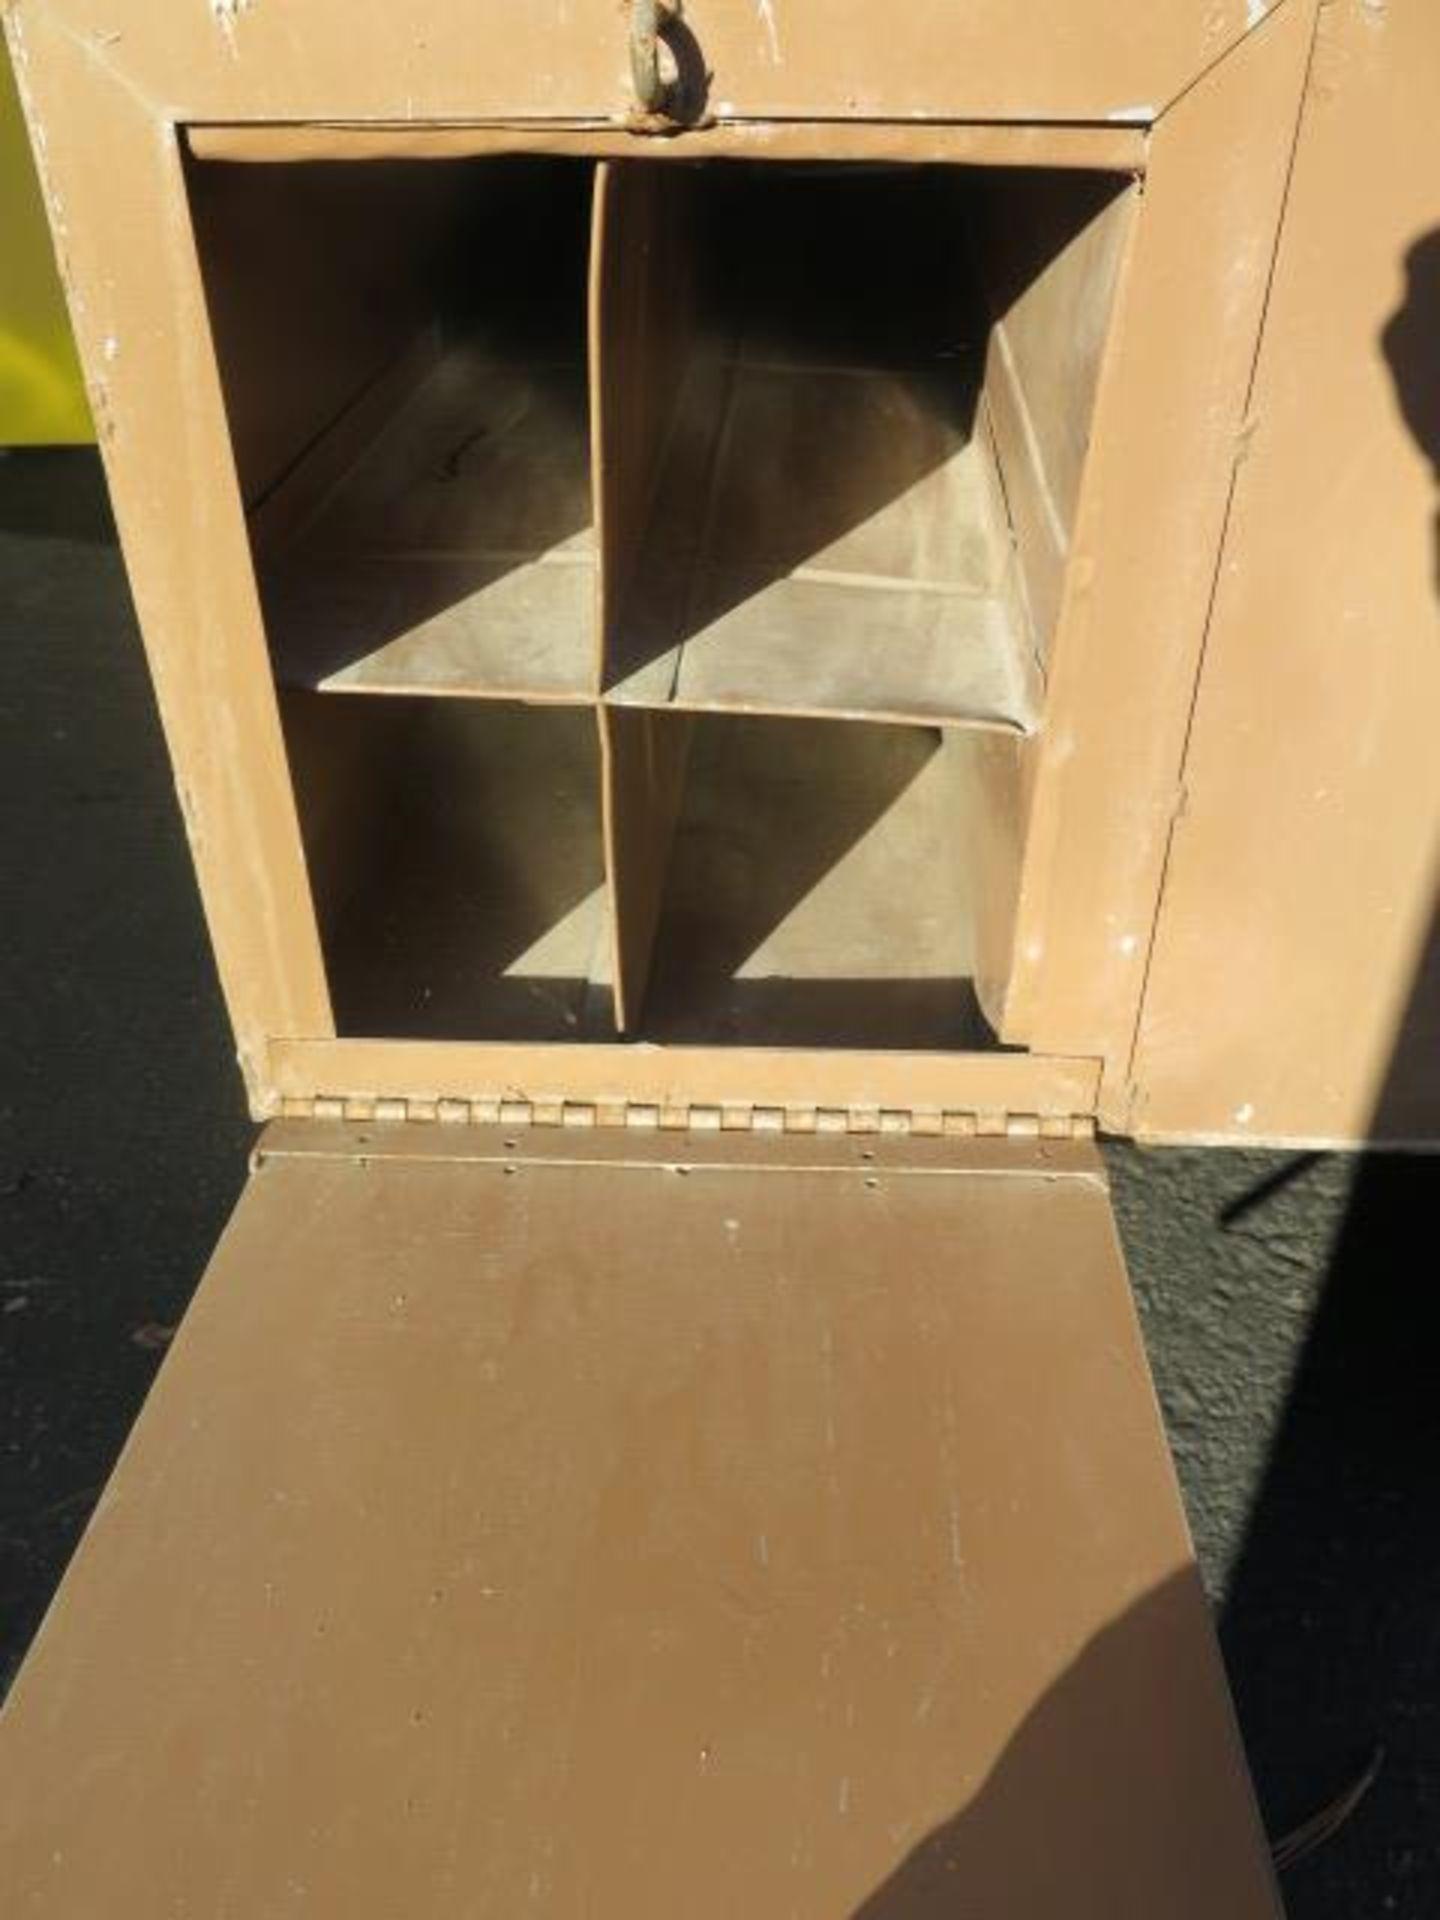 Knaack mdl. 89 Storagemaster Rolling Job Box (SOLD AS-IS - NO WARRANTY) - Image 11 of 12